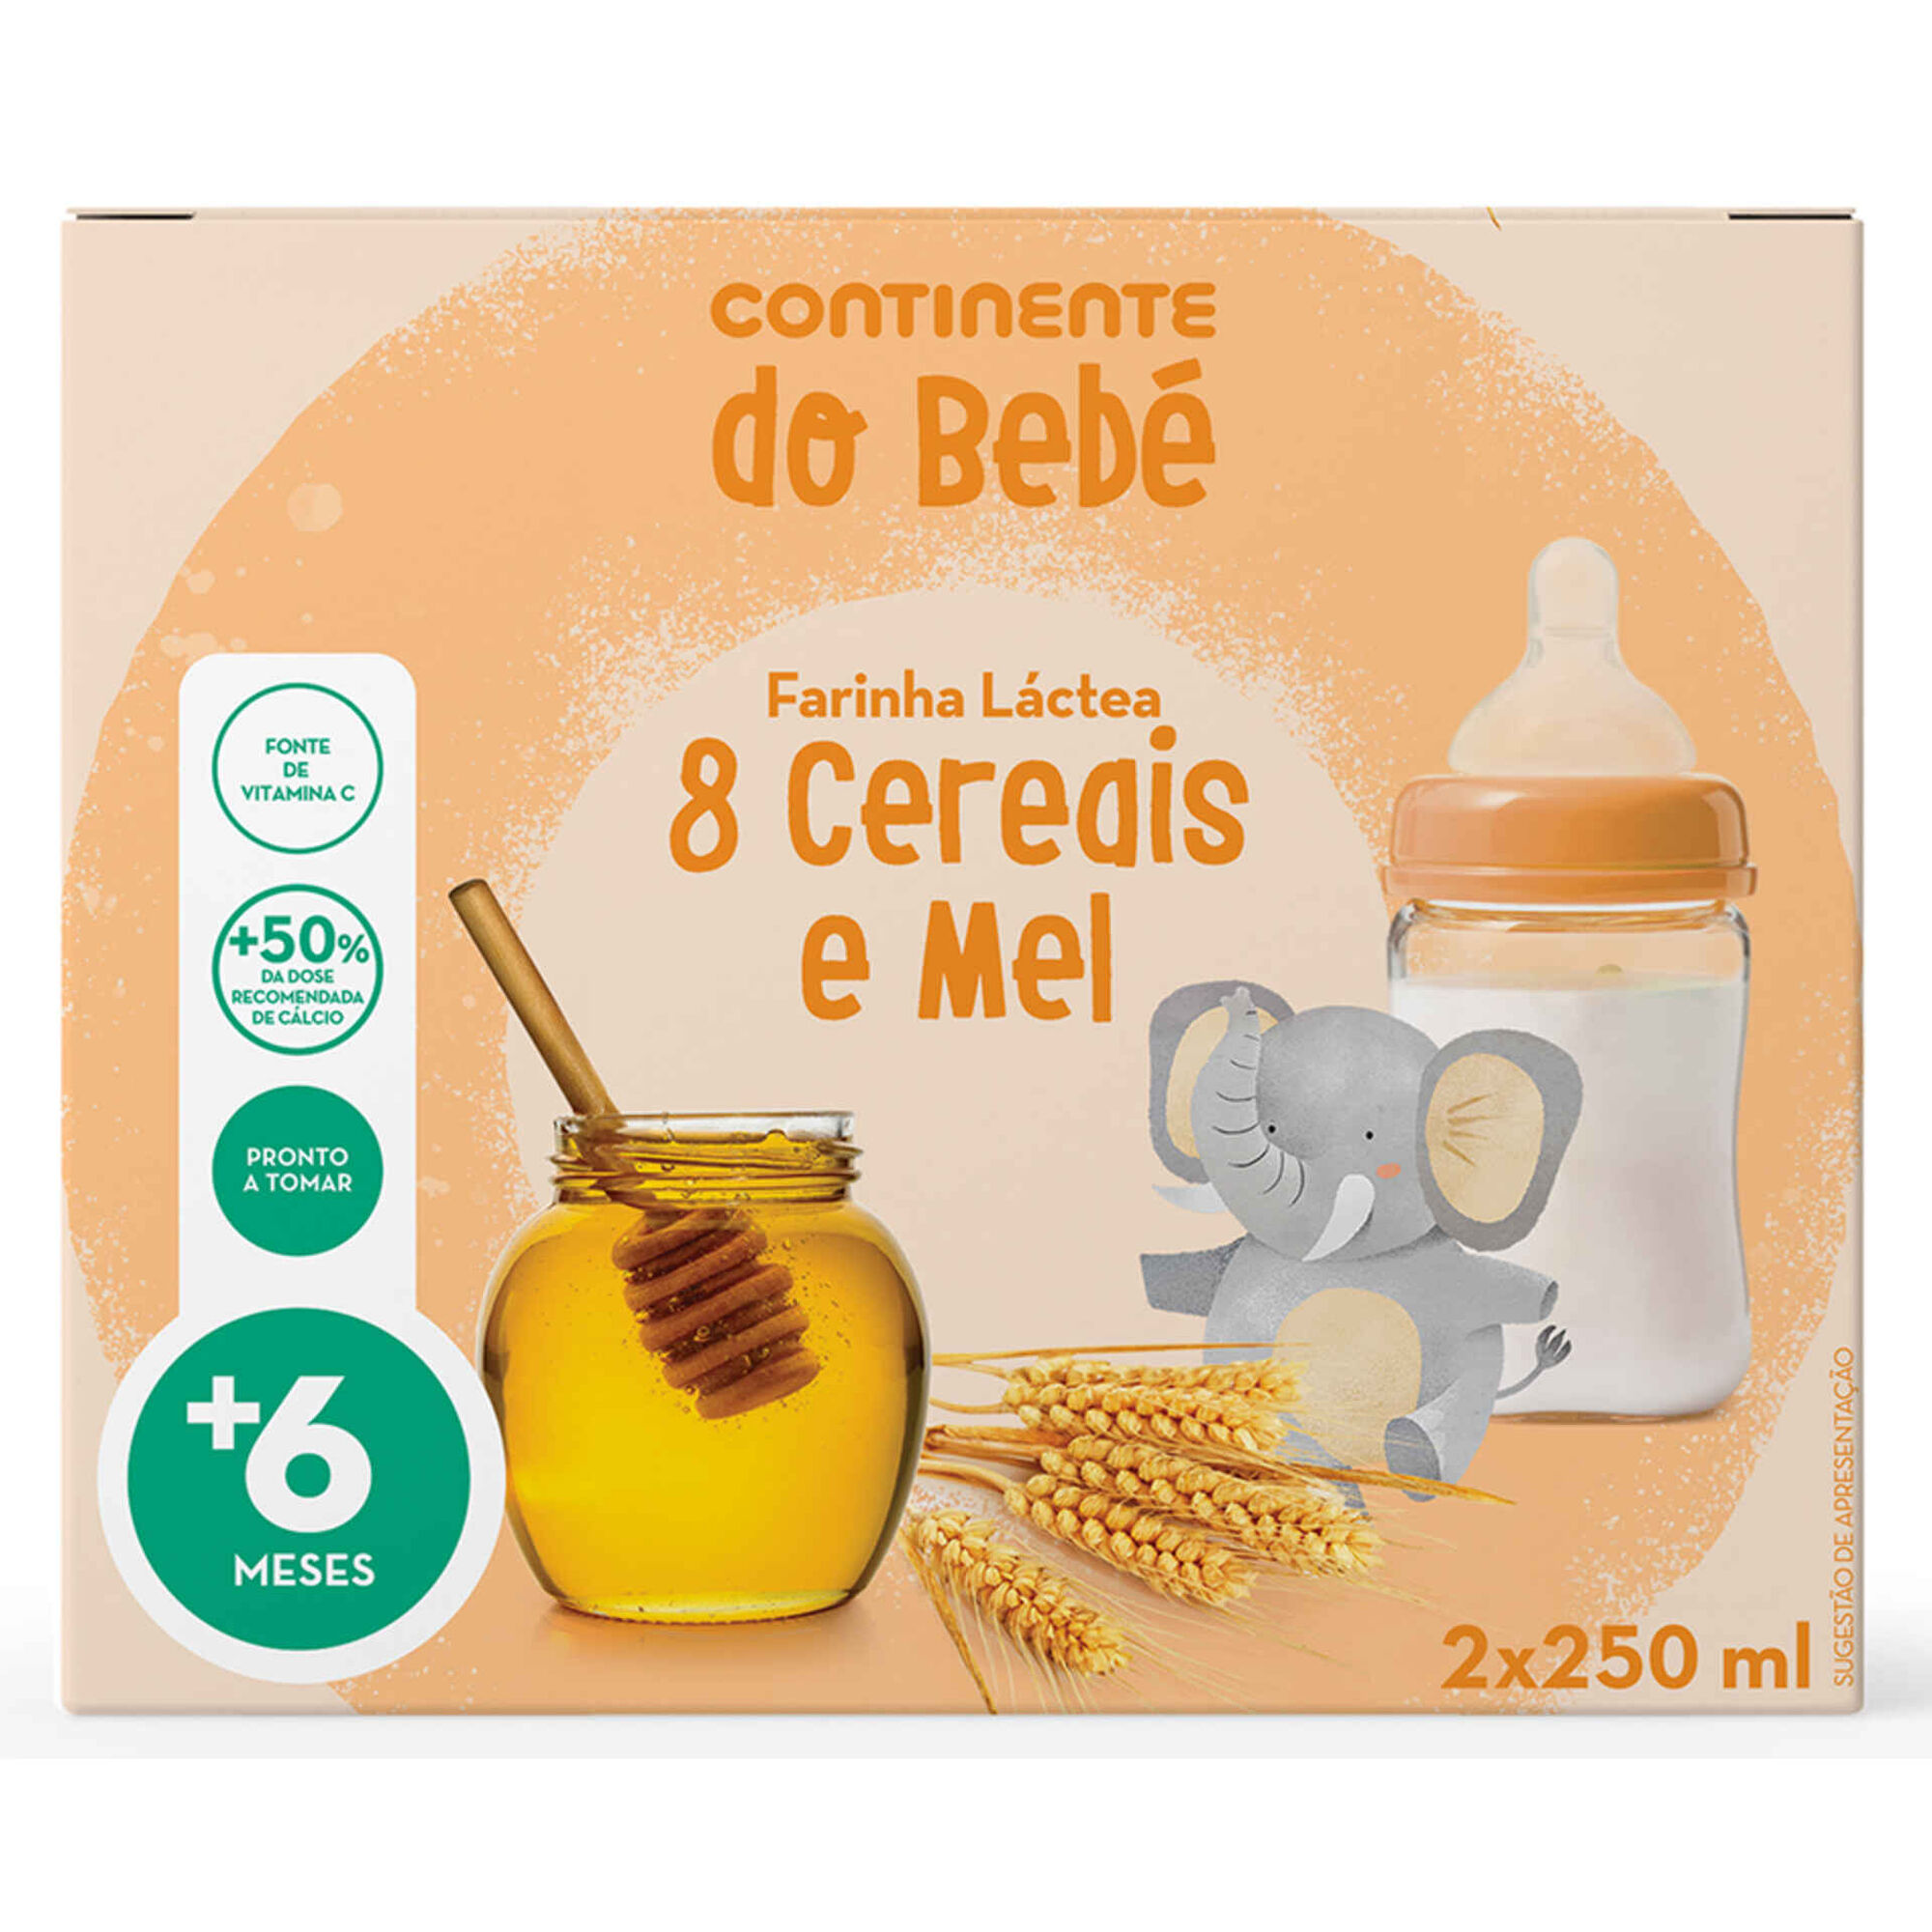 Papa Infantil Farinha Láctea 8 Cereais e Mel +6 Meses